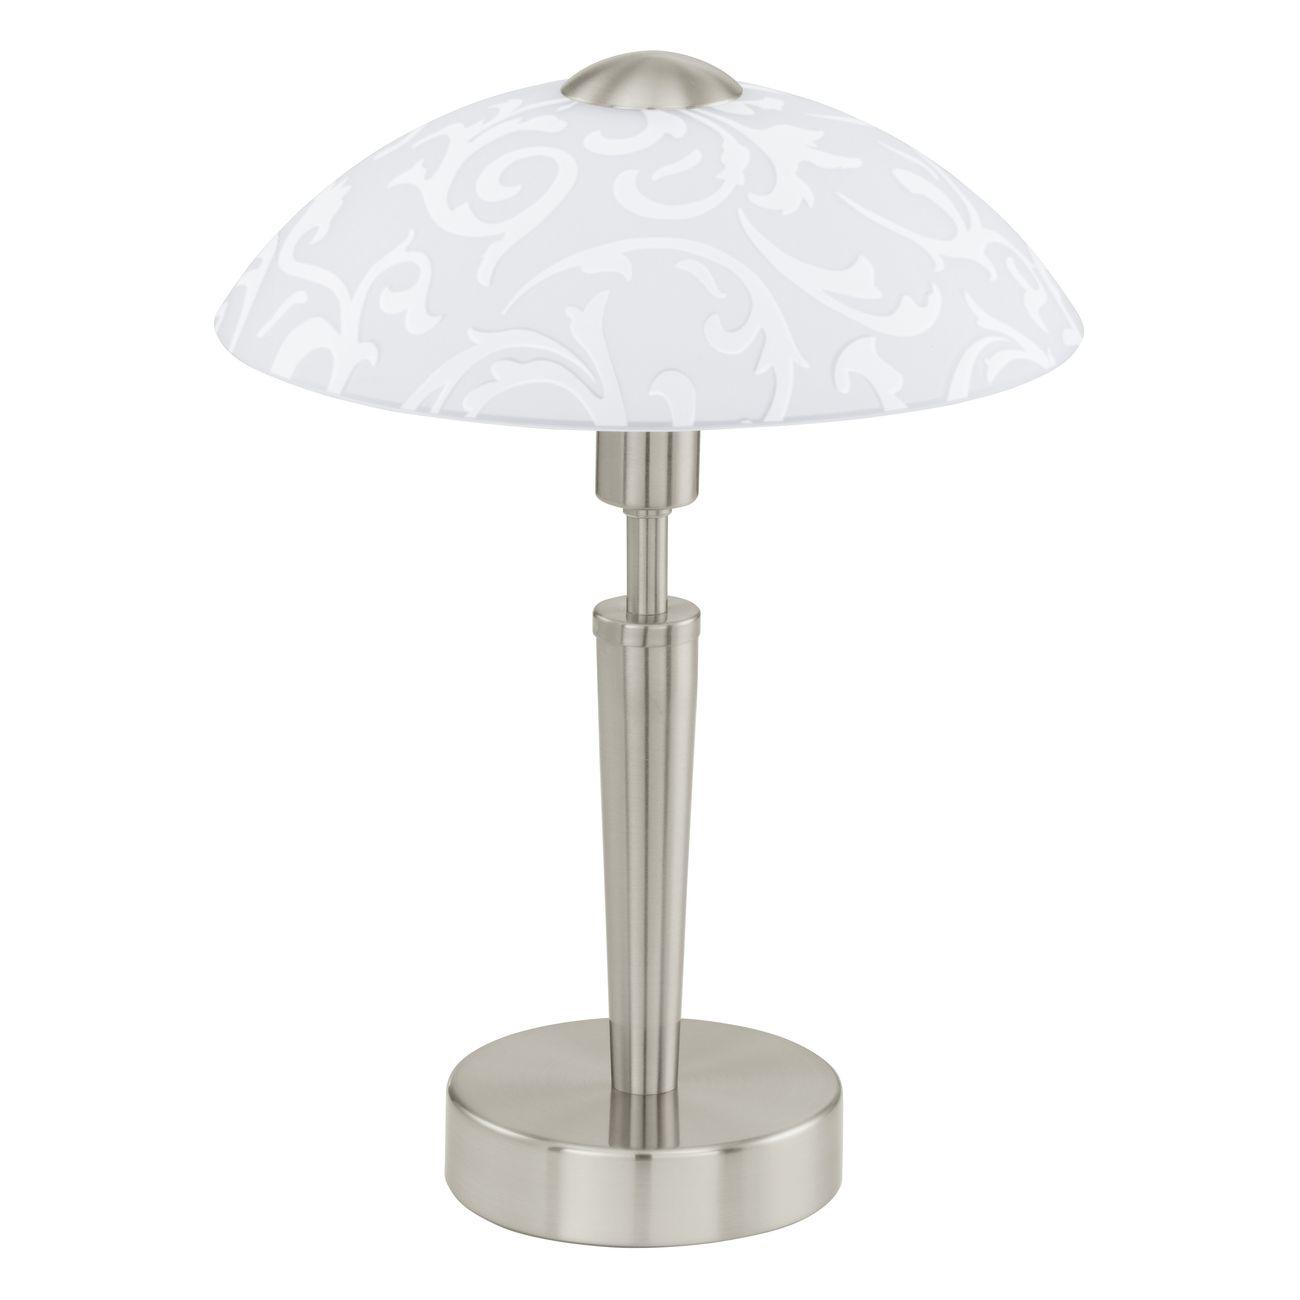 Eglo 91238 SOLO stolní lampa